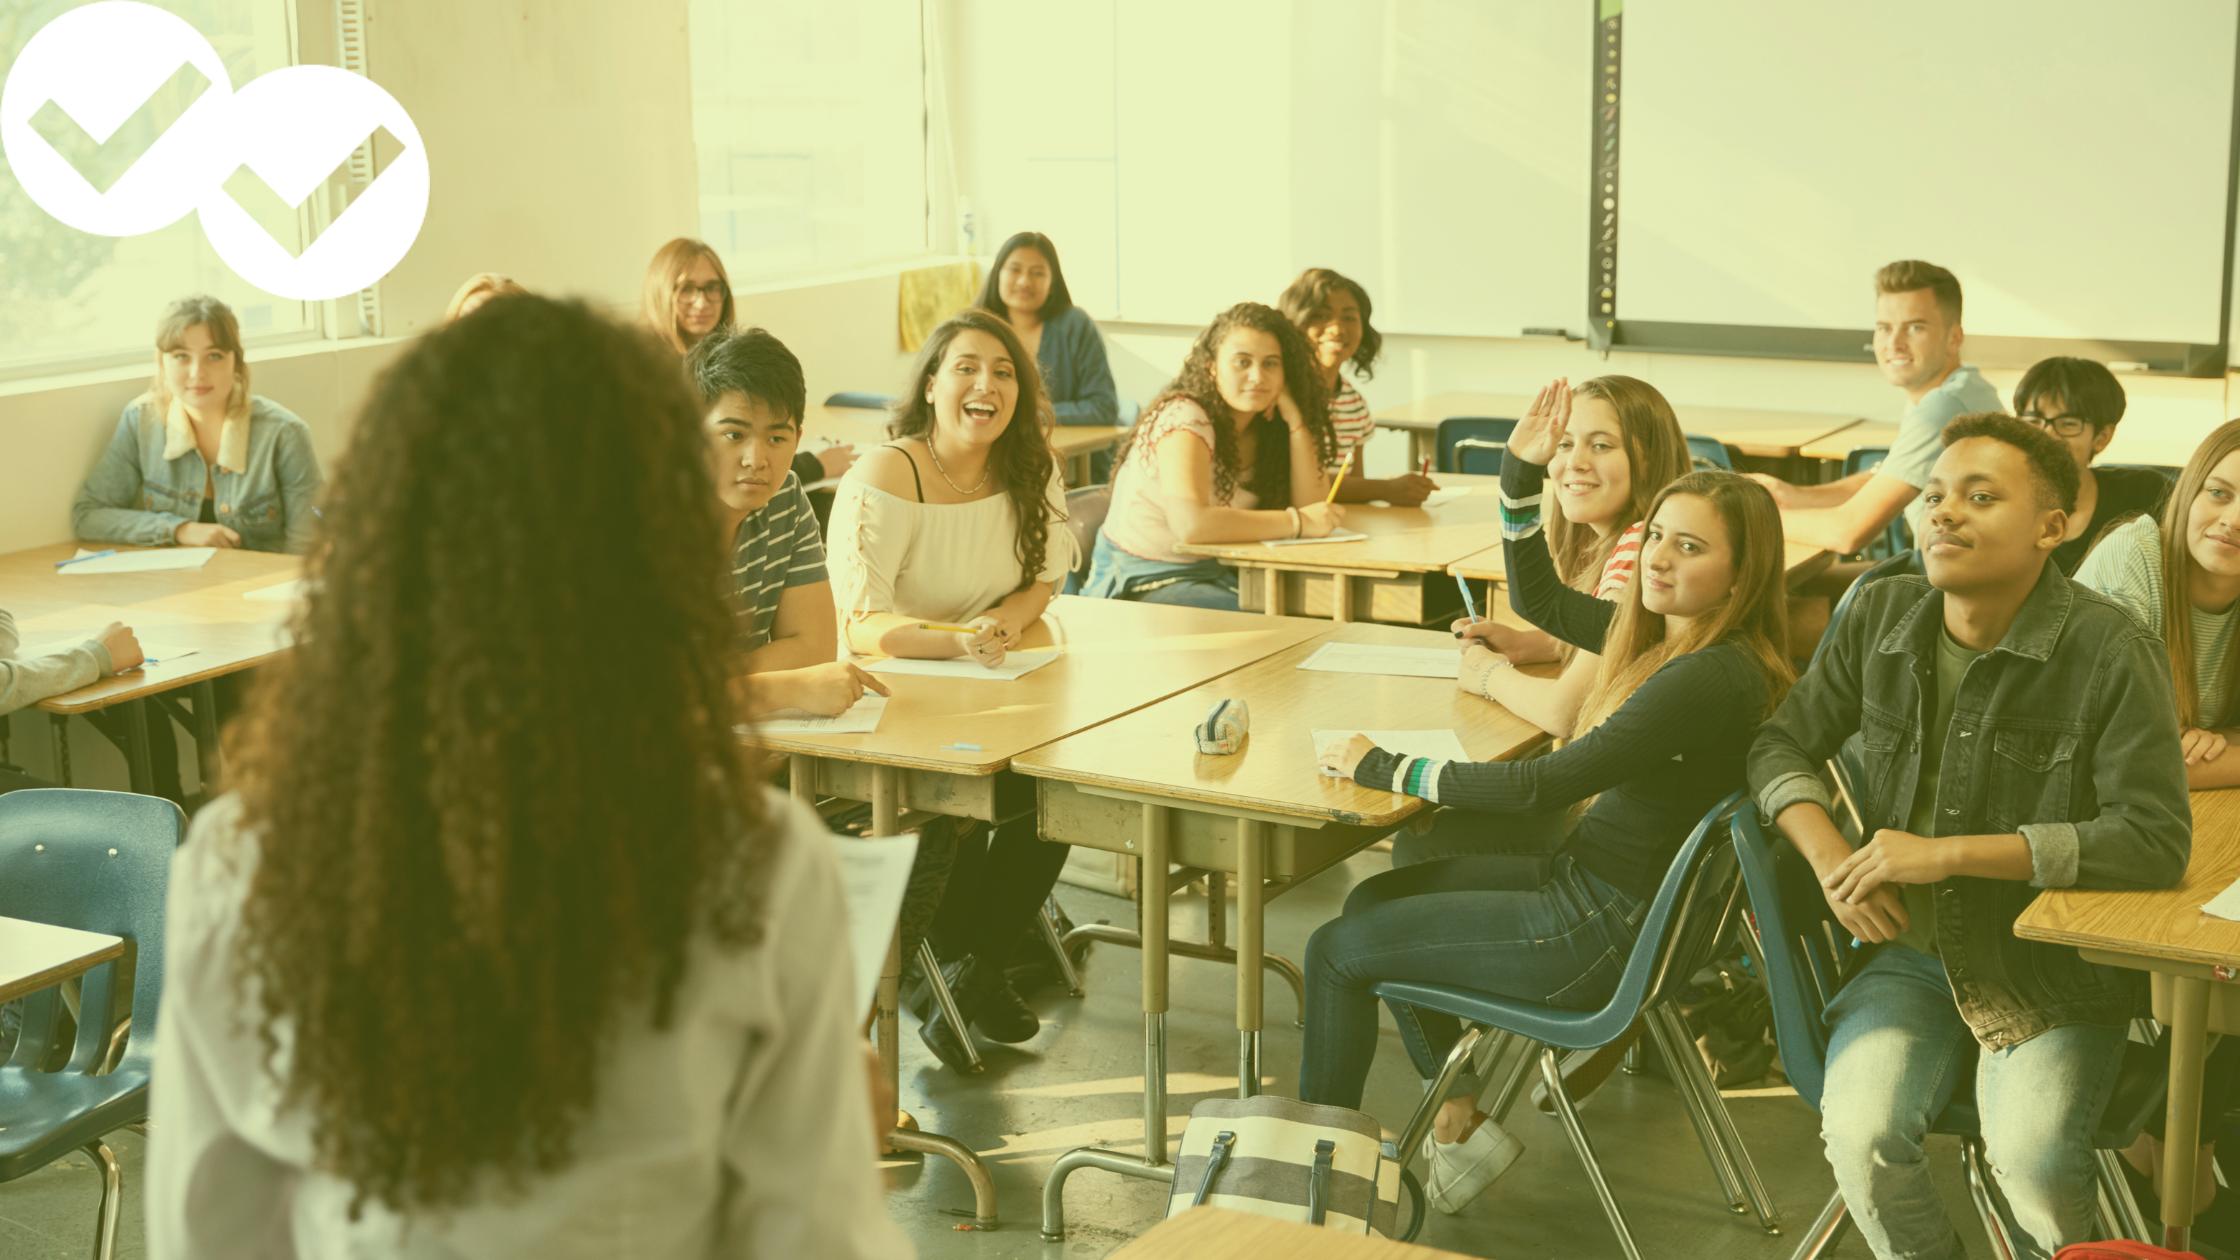 discussing sensitive topics in the classroom